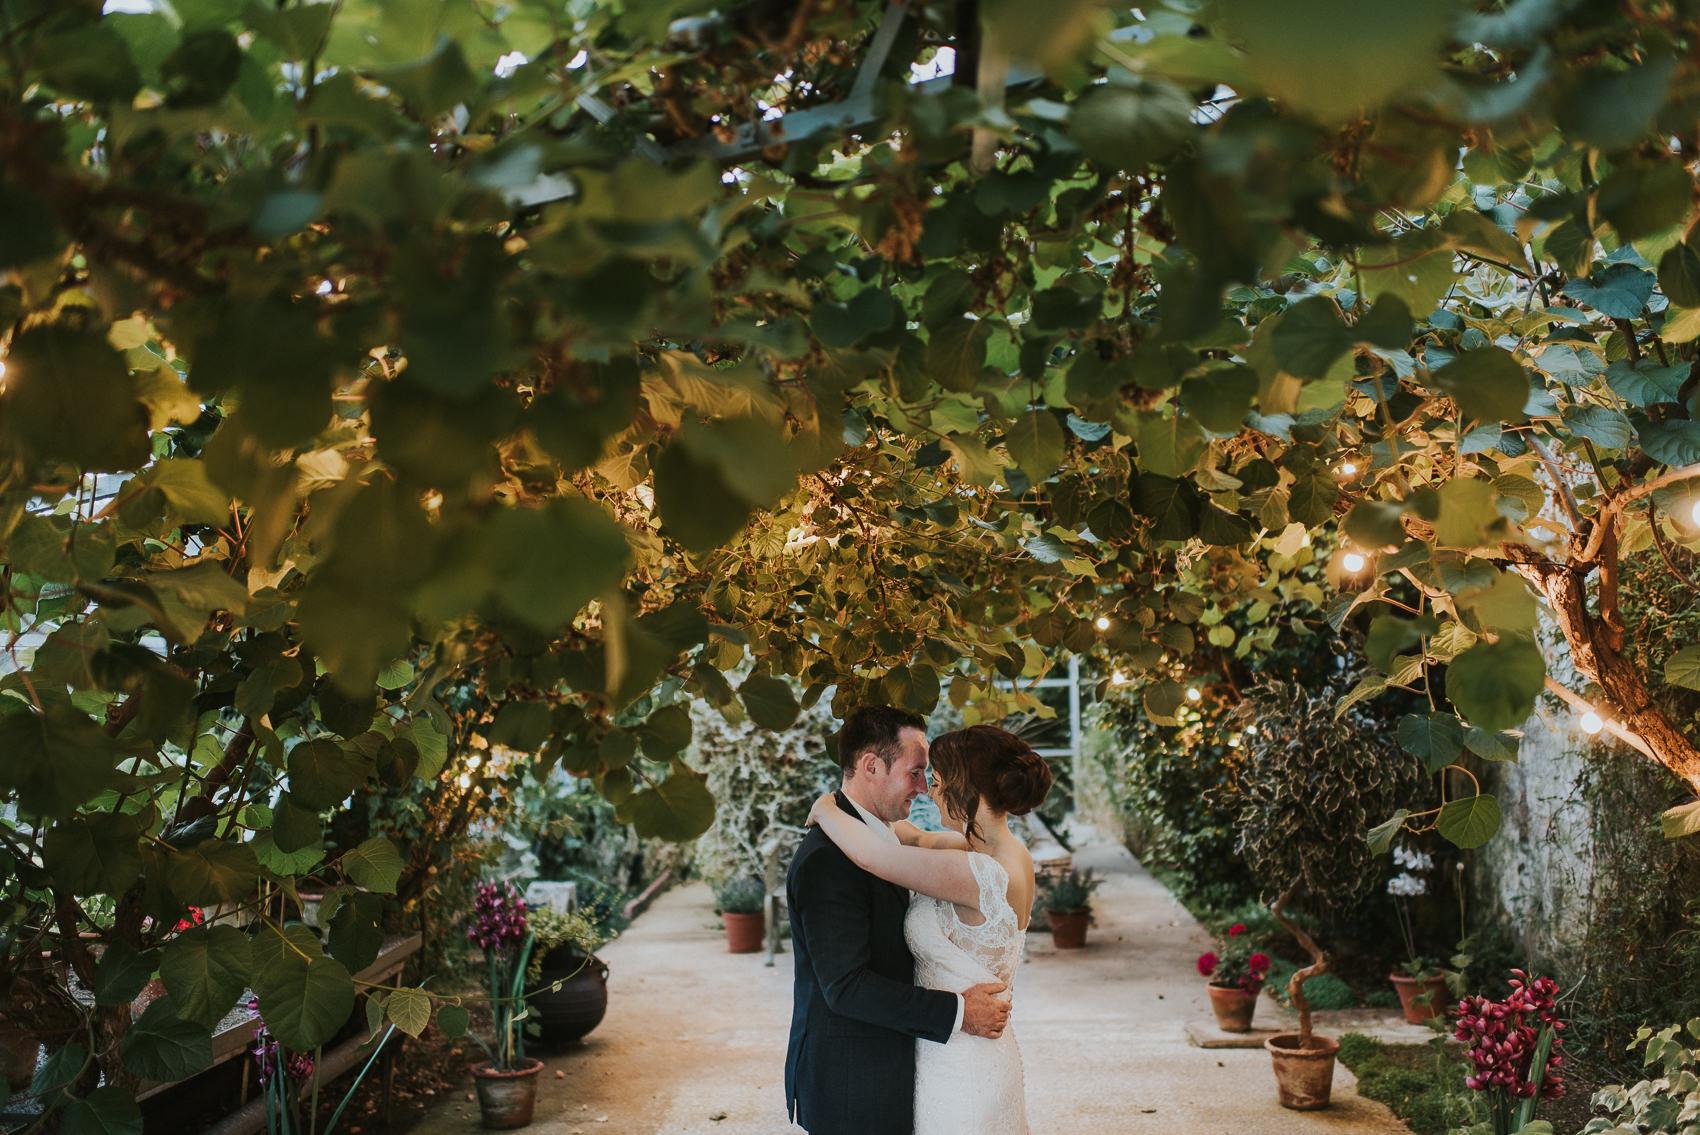 Photography by Ciara - wedding photographer 5